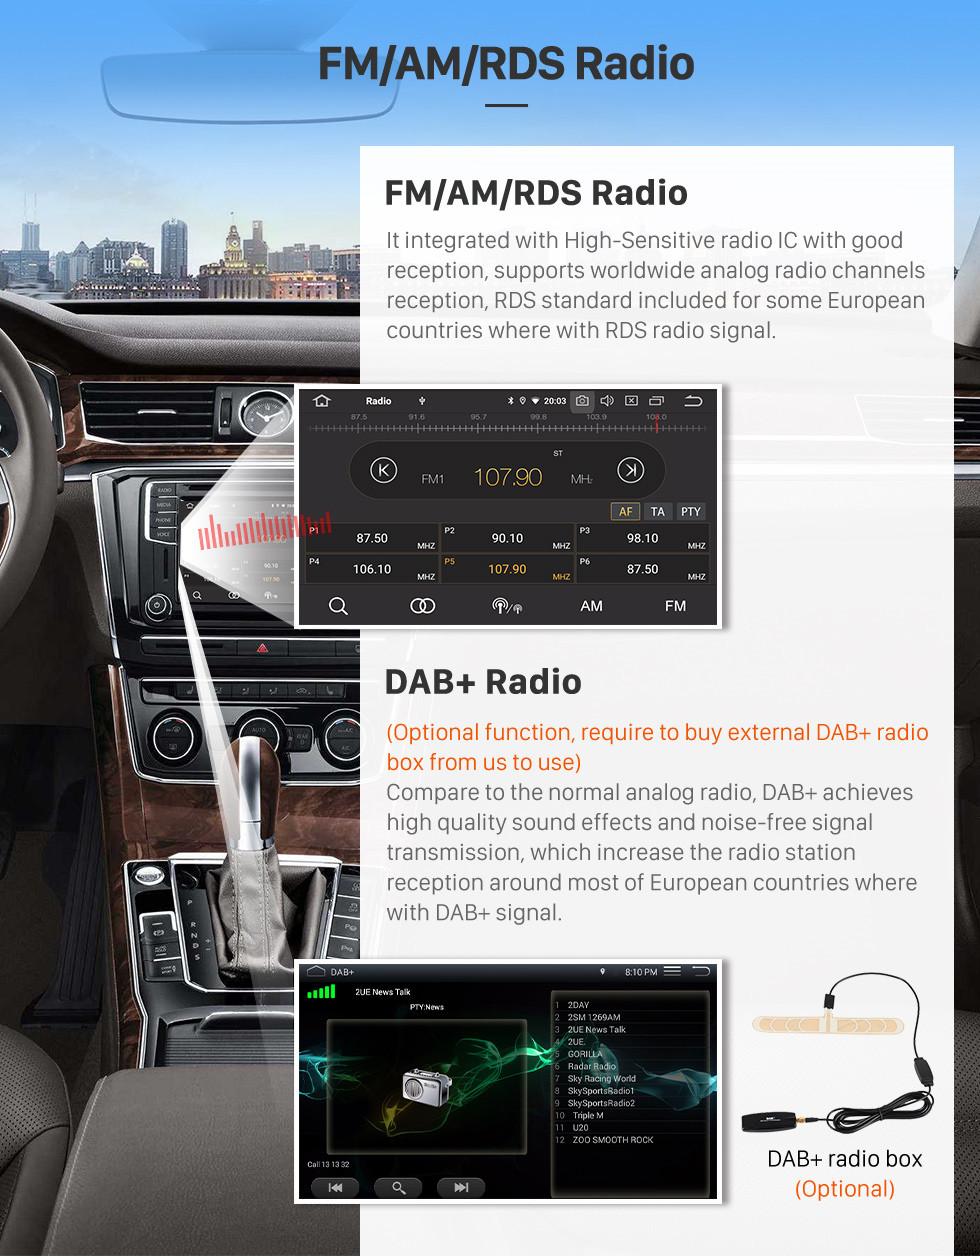 Seicane HD Touchscreen 2014-2016 Geely Emgrand EC7 Android 9.0 9 inch GPS Navigation Radio Bluetooth WIFI AUX USB Carplay support DAB+ DVR OBD2